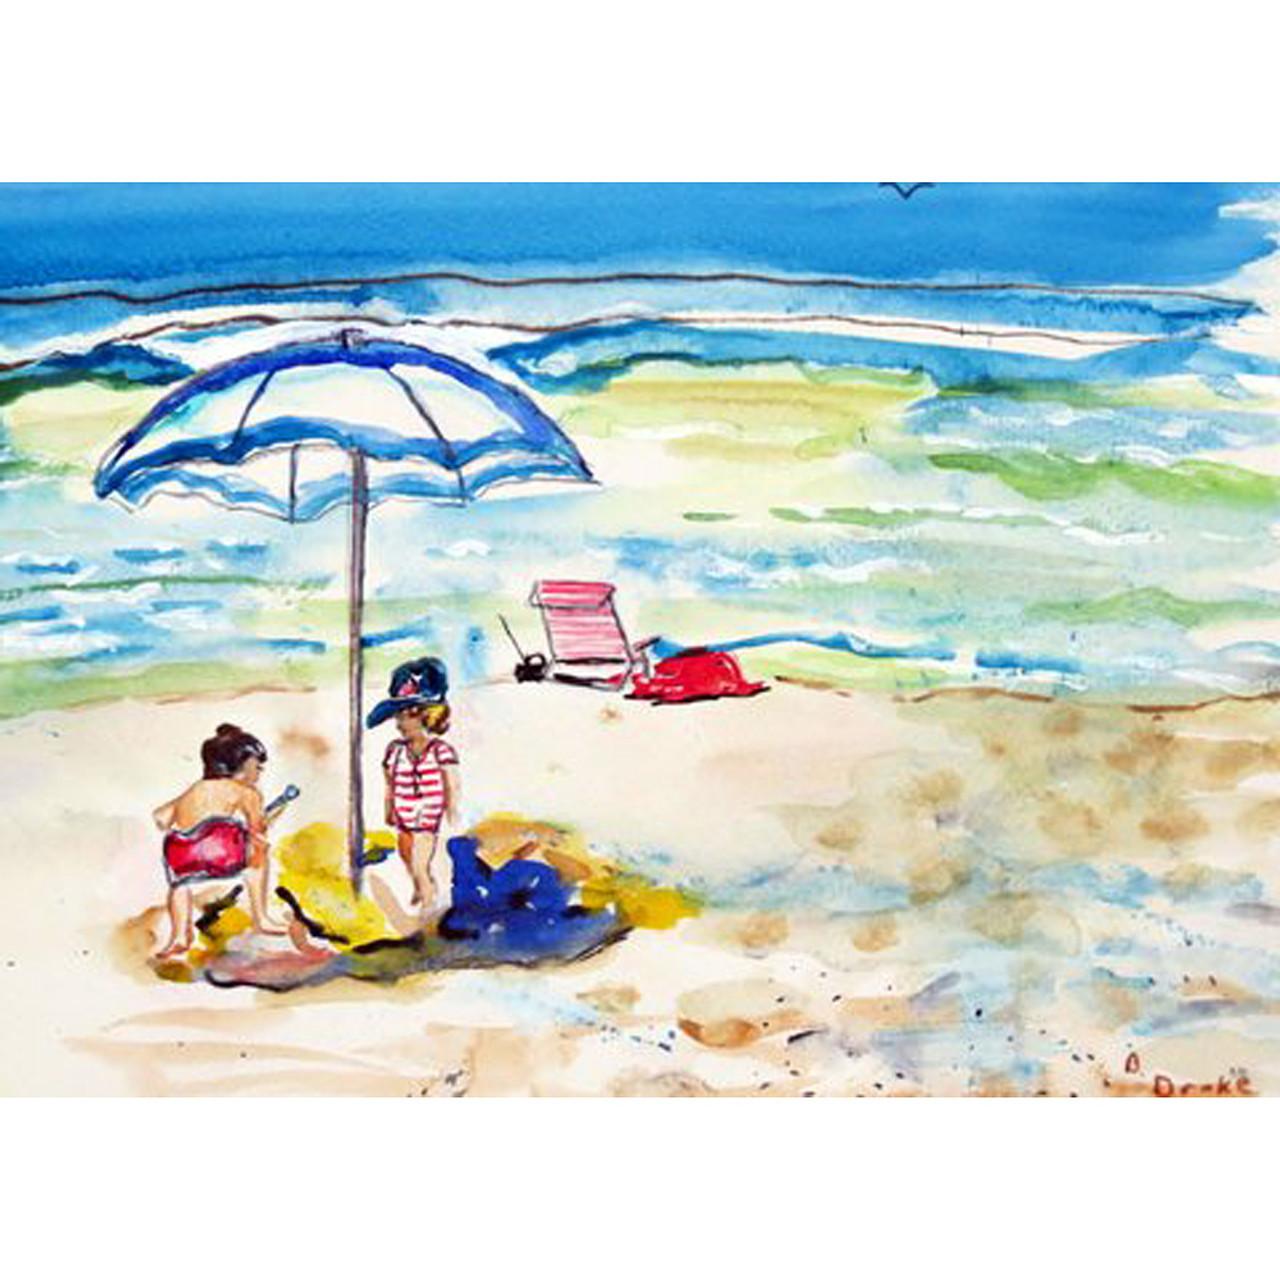 Children At The Beach Place Mats - Set of 2